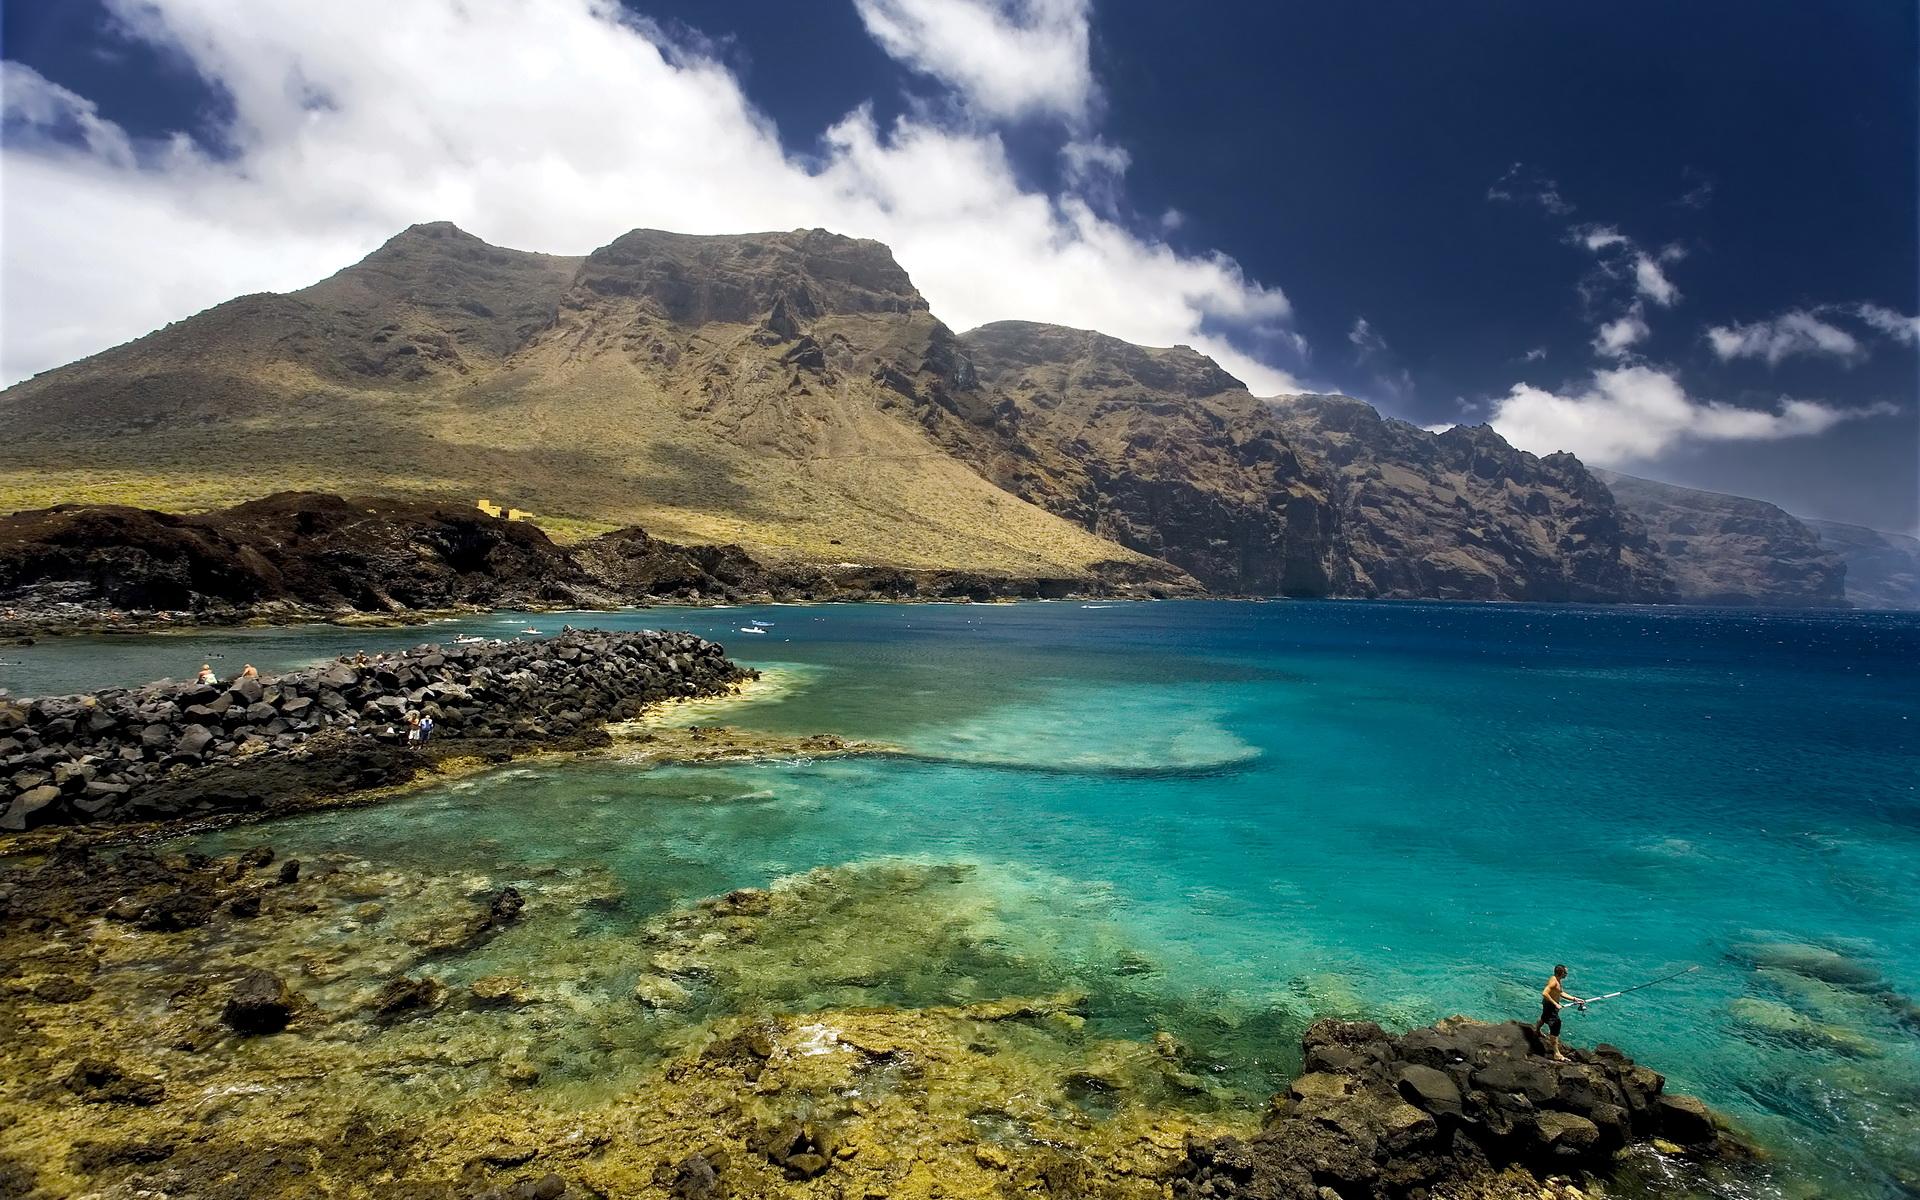 Tenerife Island High Resolution Wallpaper   Travel HD Wallpapers 1920x1200